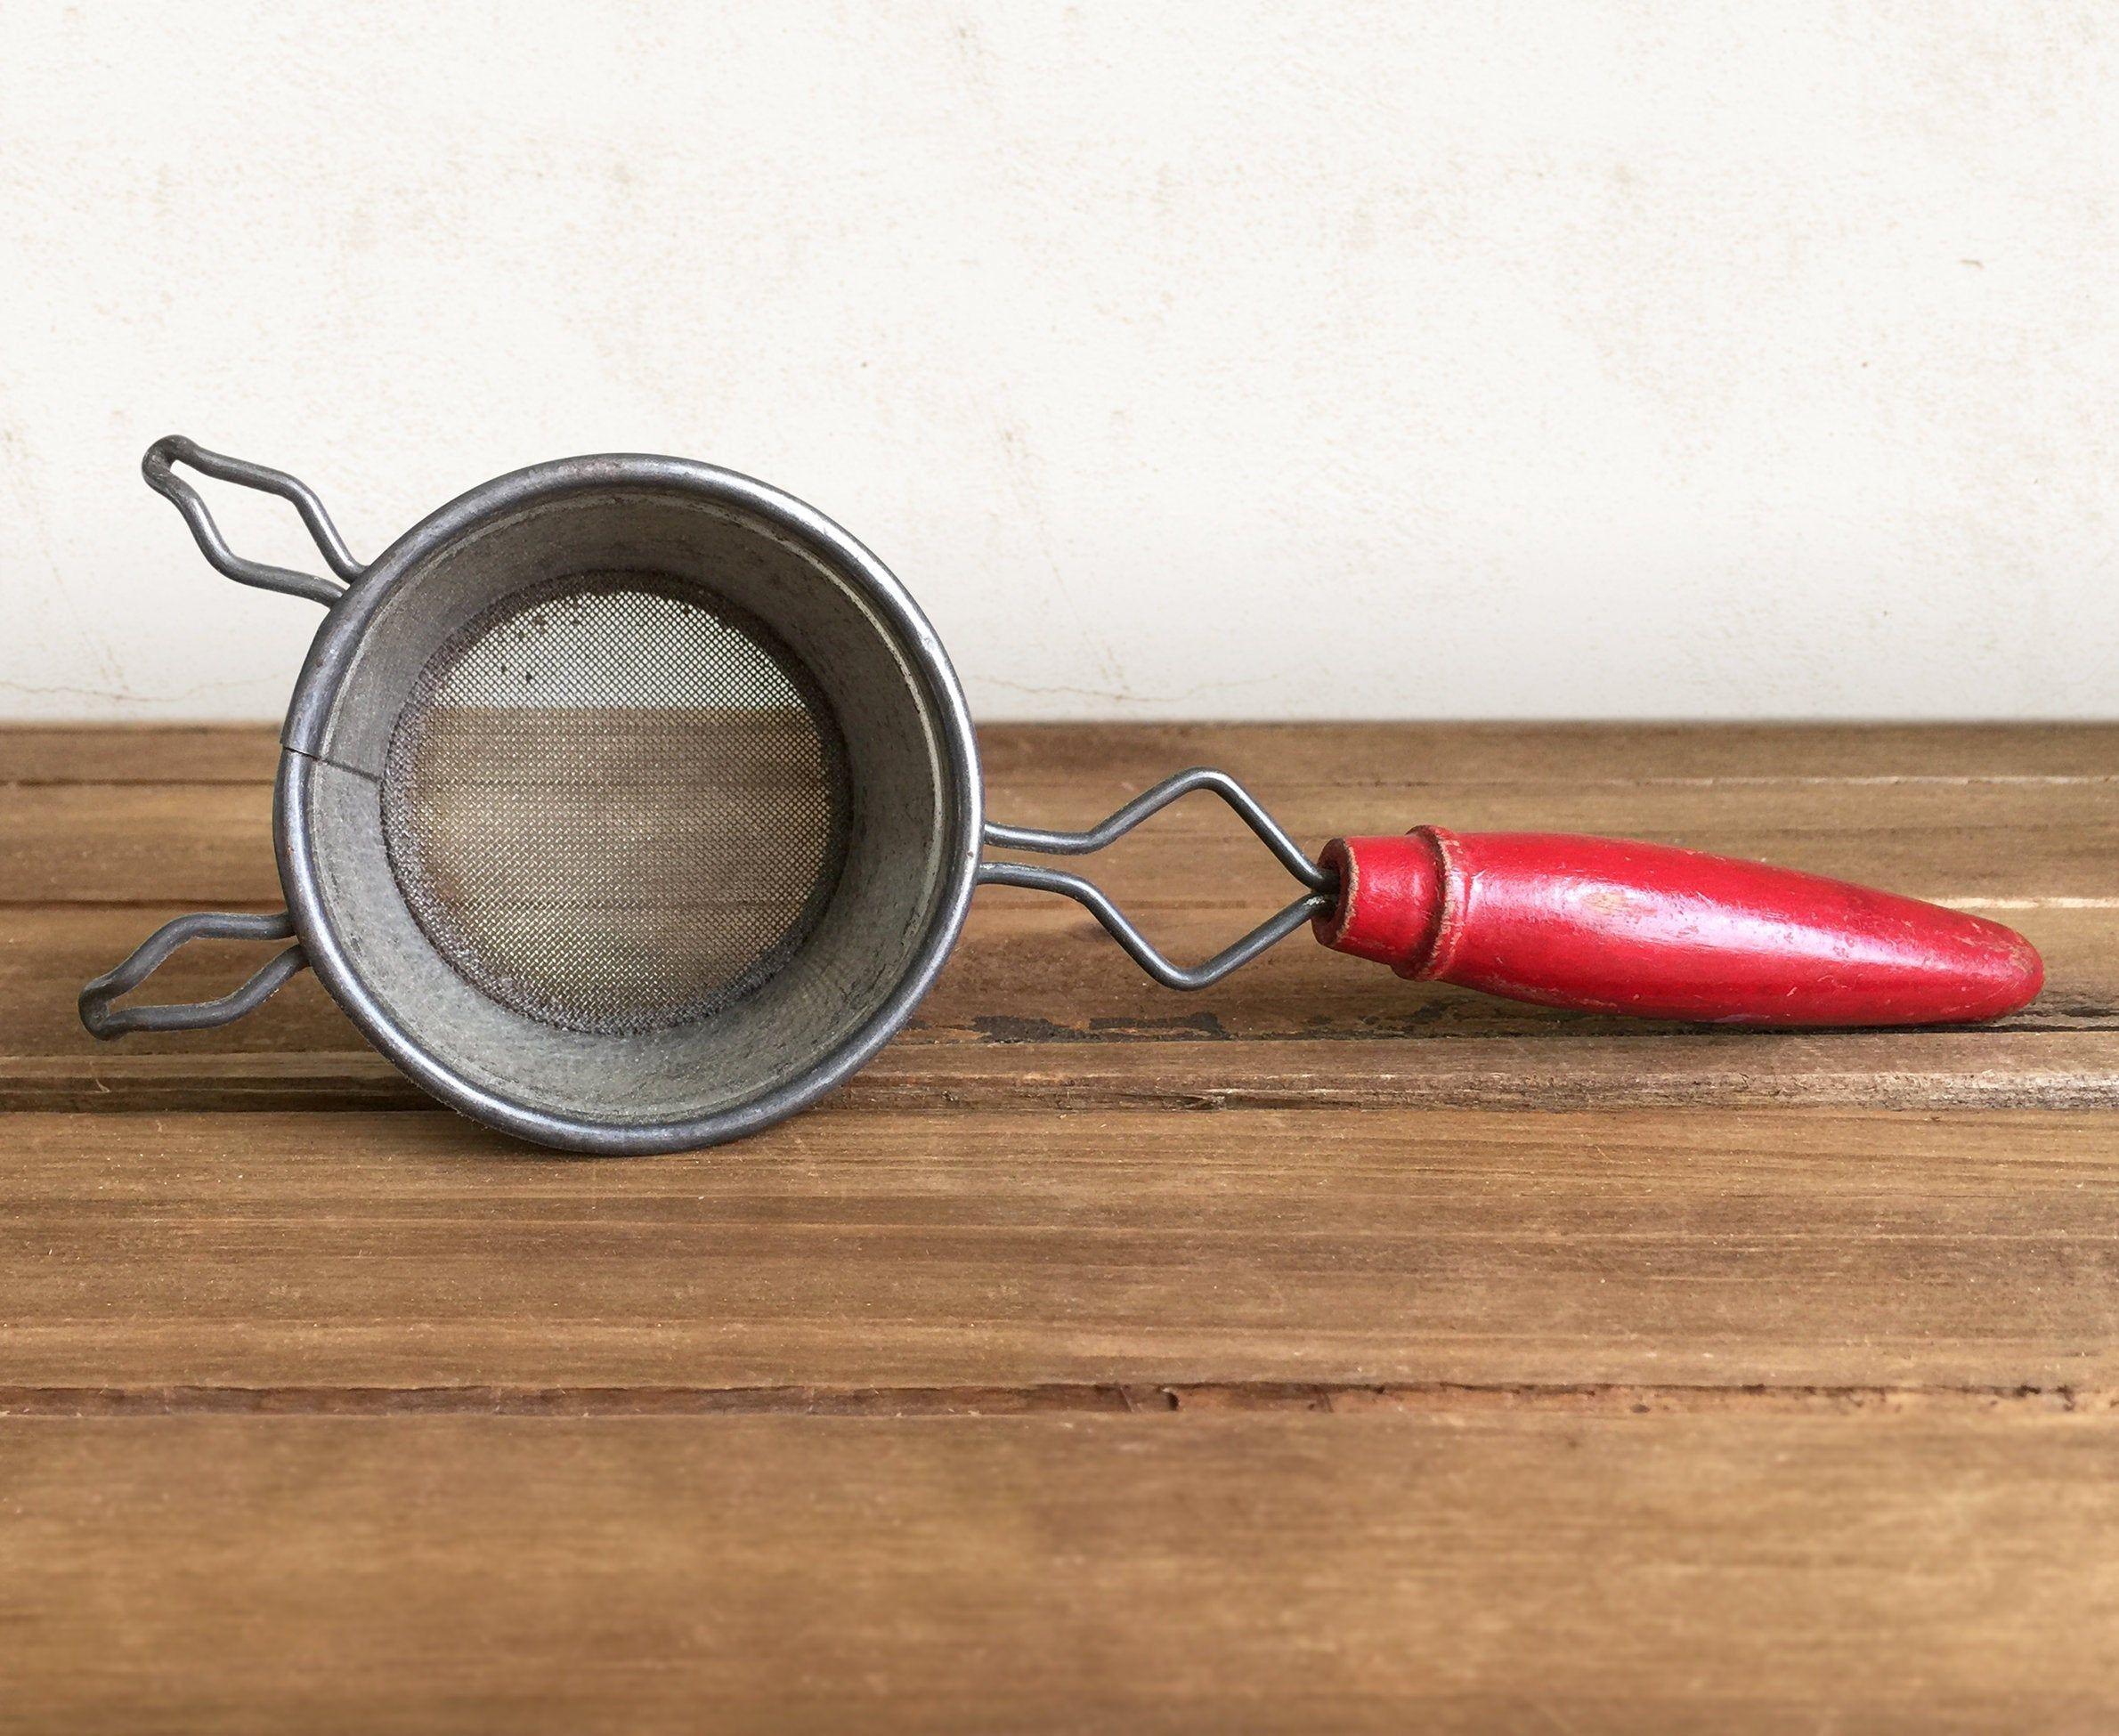 VIntage Tea Strainer Vintage Kitchen Gadget, Vintage Small Sifter with Red Wood Handle Red wood handle strainer